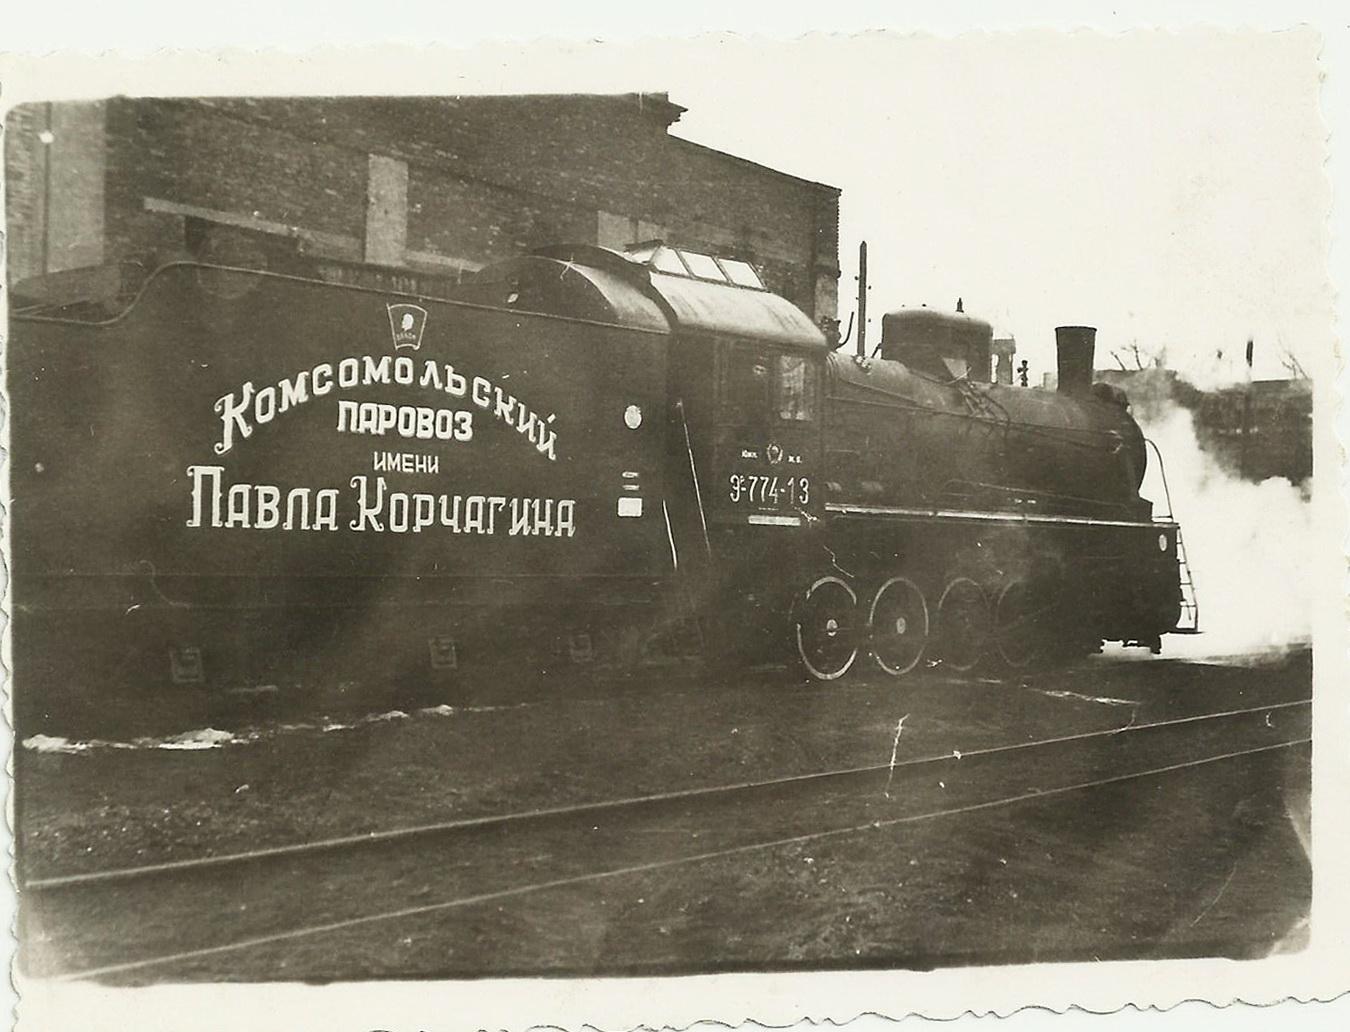 Комсомольский Паровоз им. Павла Корчагина